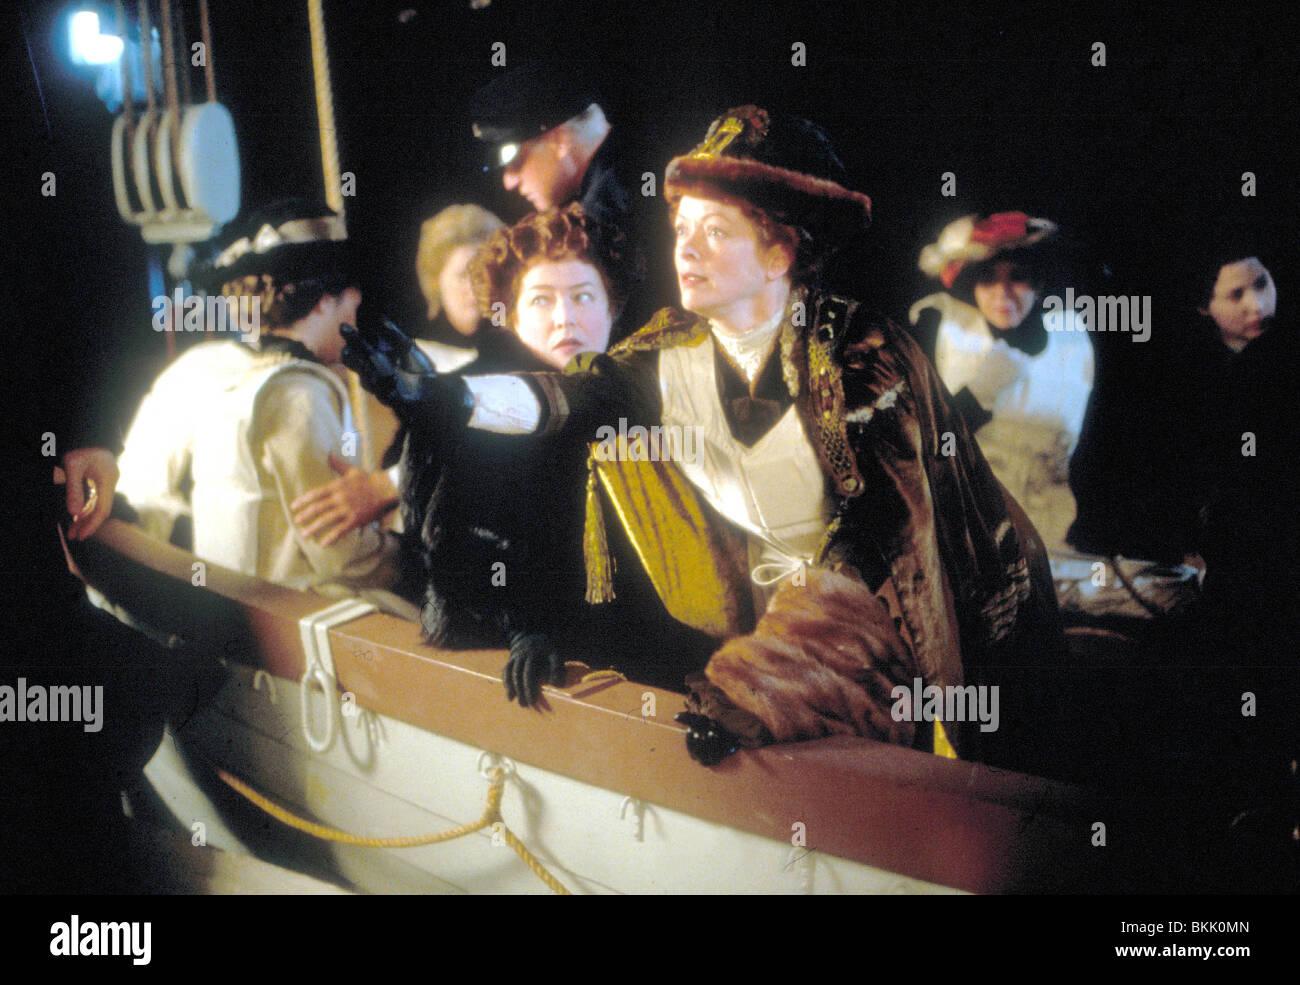 TITANIC (1997) KATHY BATES, FRANCES FISHER TITI 014 - Stock Image